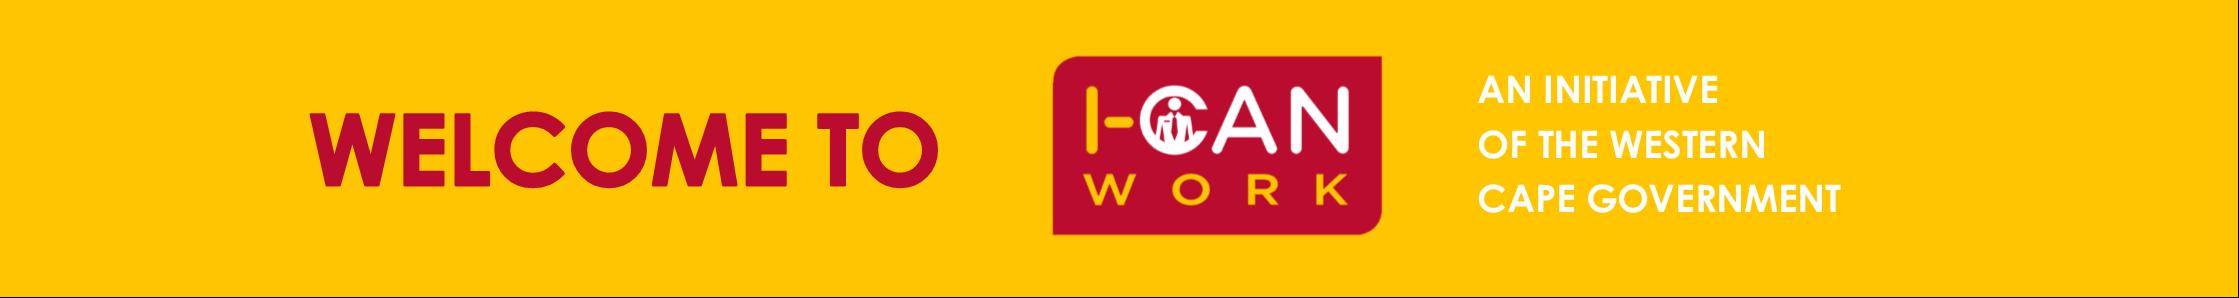 I-CAN WORK Header